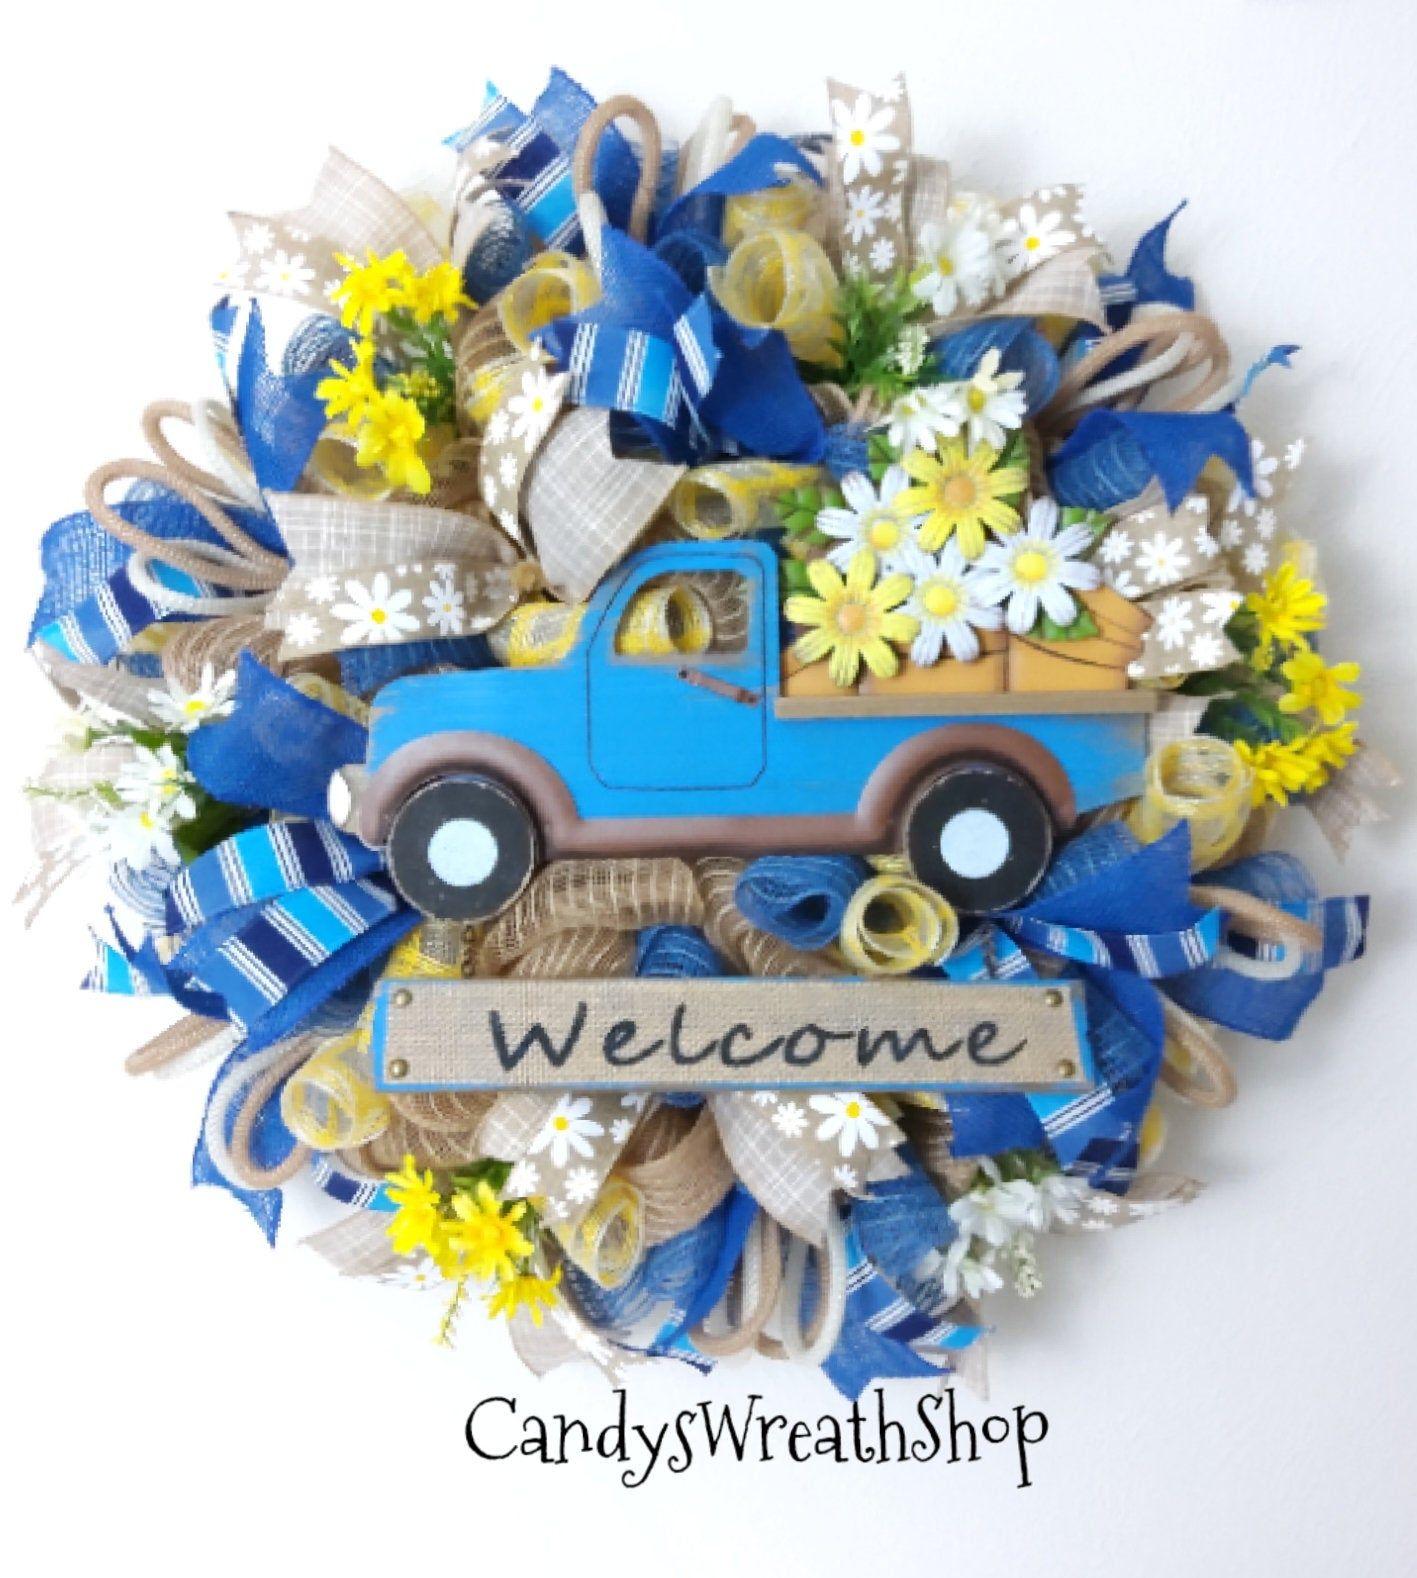 Photo of Welcome Wreath, Spring Wreath, Daisy Wreath, Truck Wreath, Floral Wreath, Farmhouse Wreath, Mother's Day Wreath, Spring Decor, Summer Decor